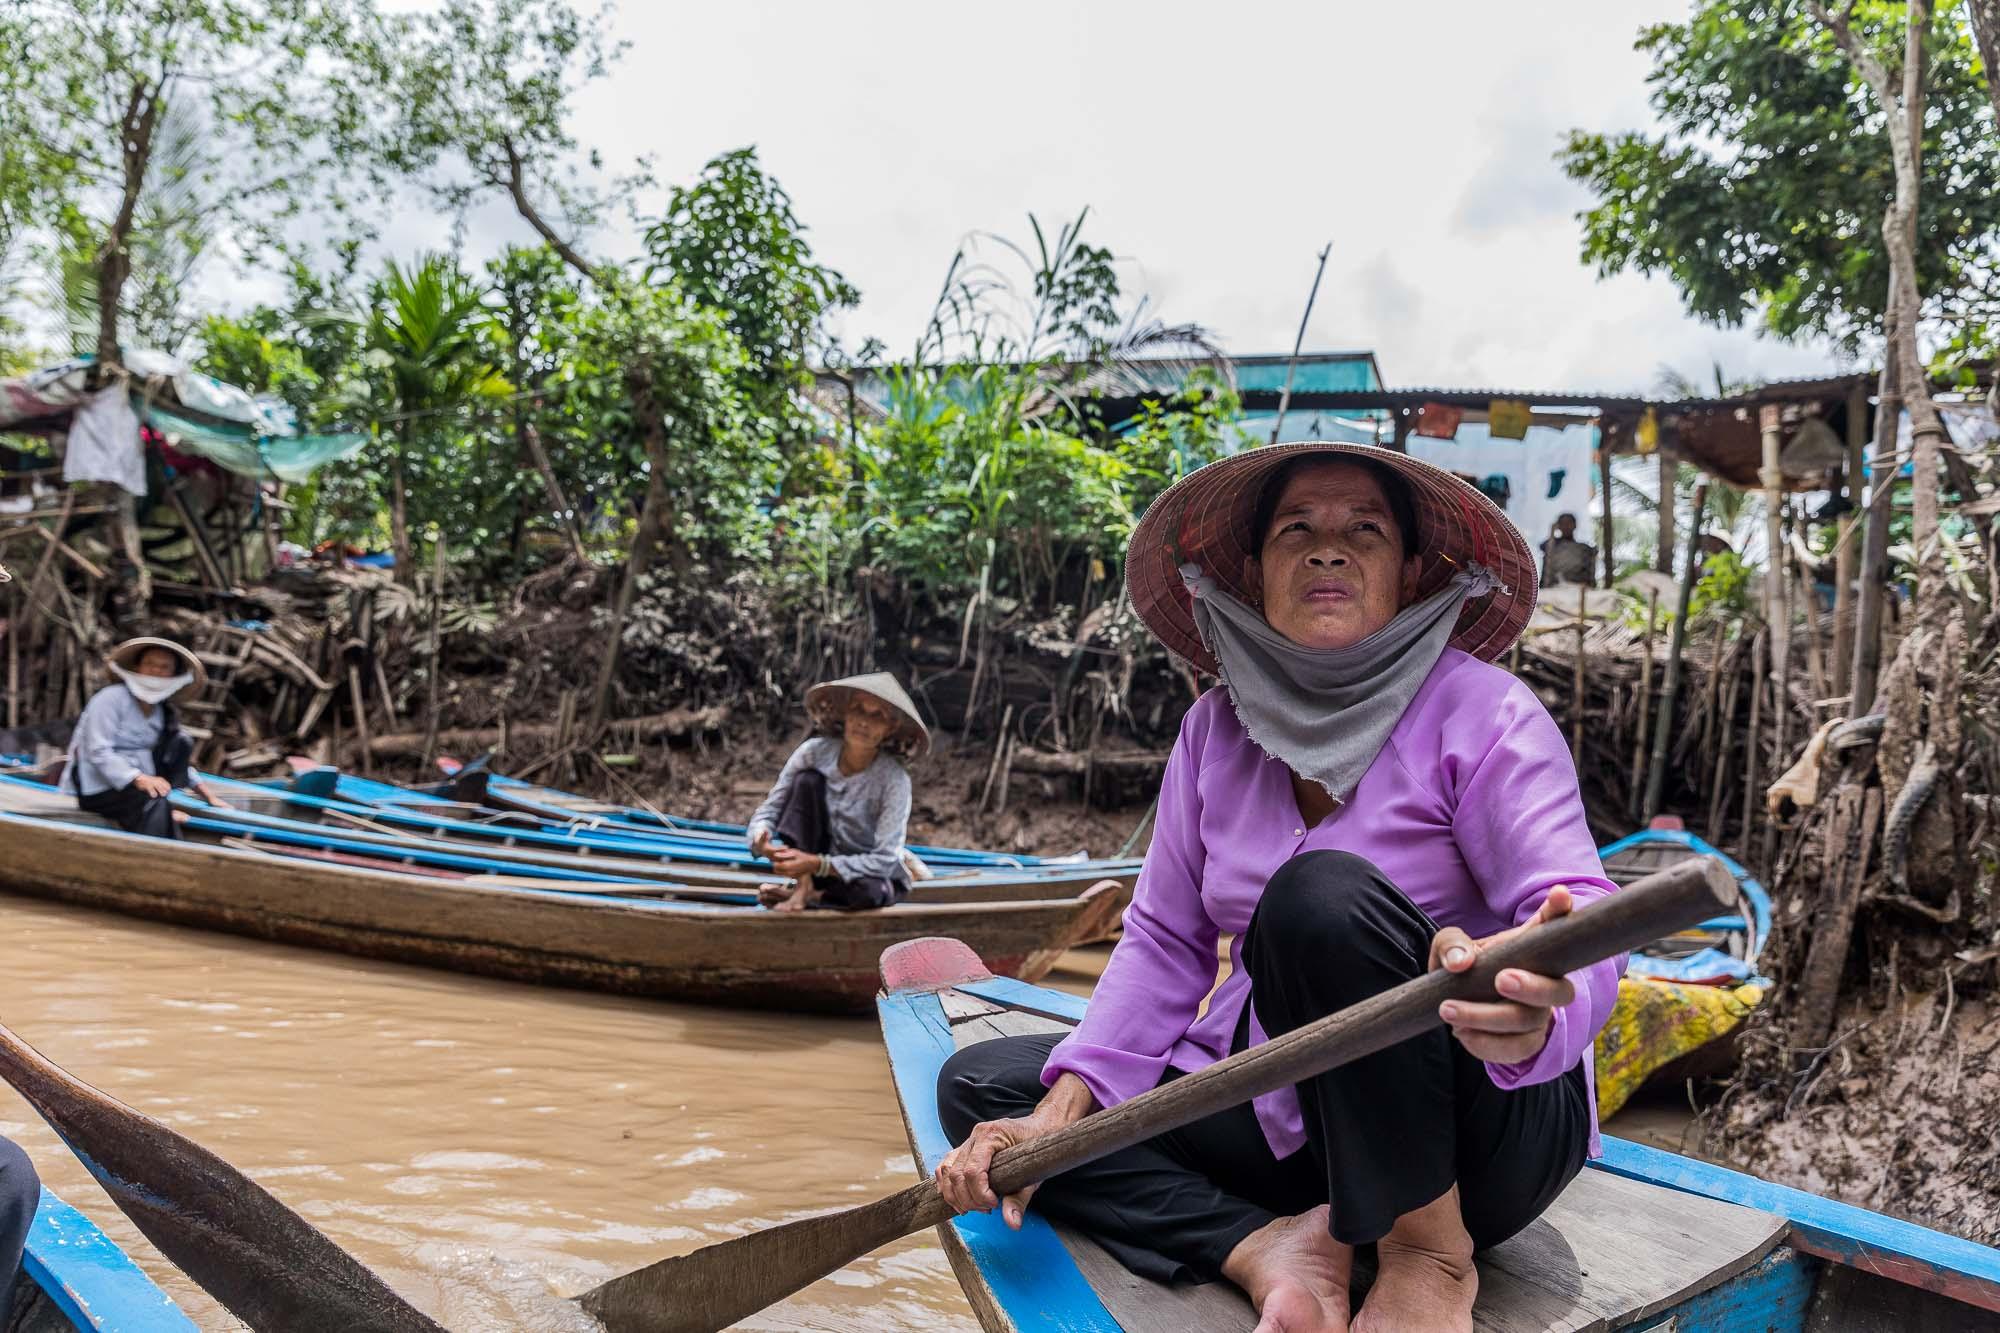 vietnam_2016_hcmc_jusmedic_240